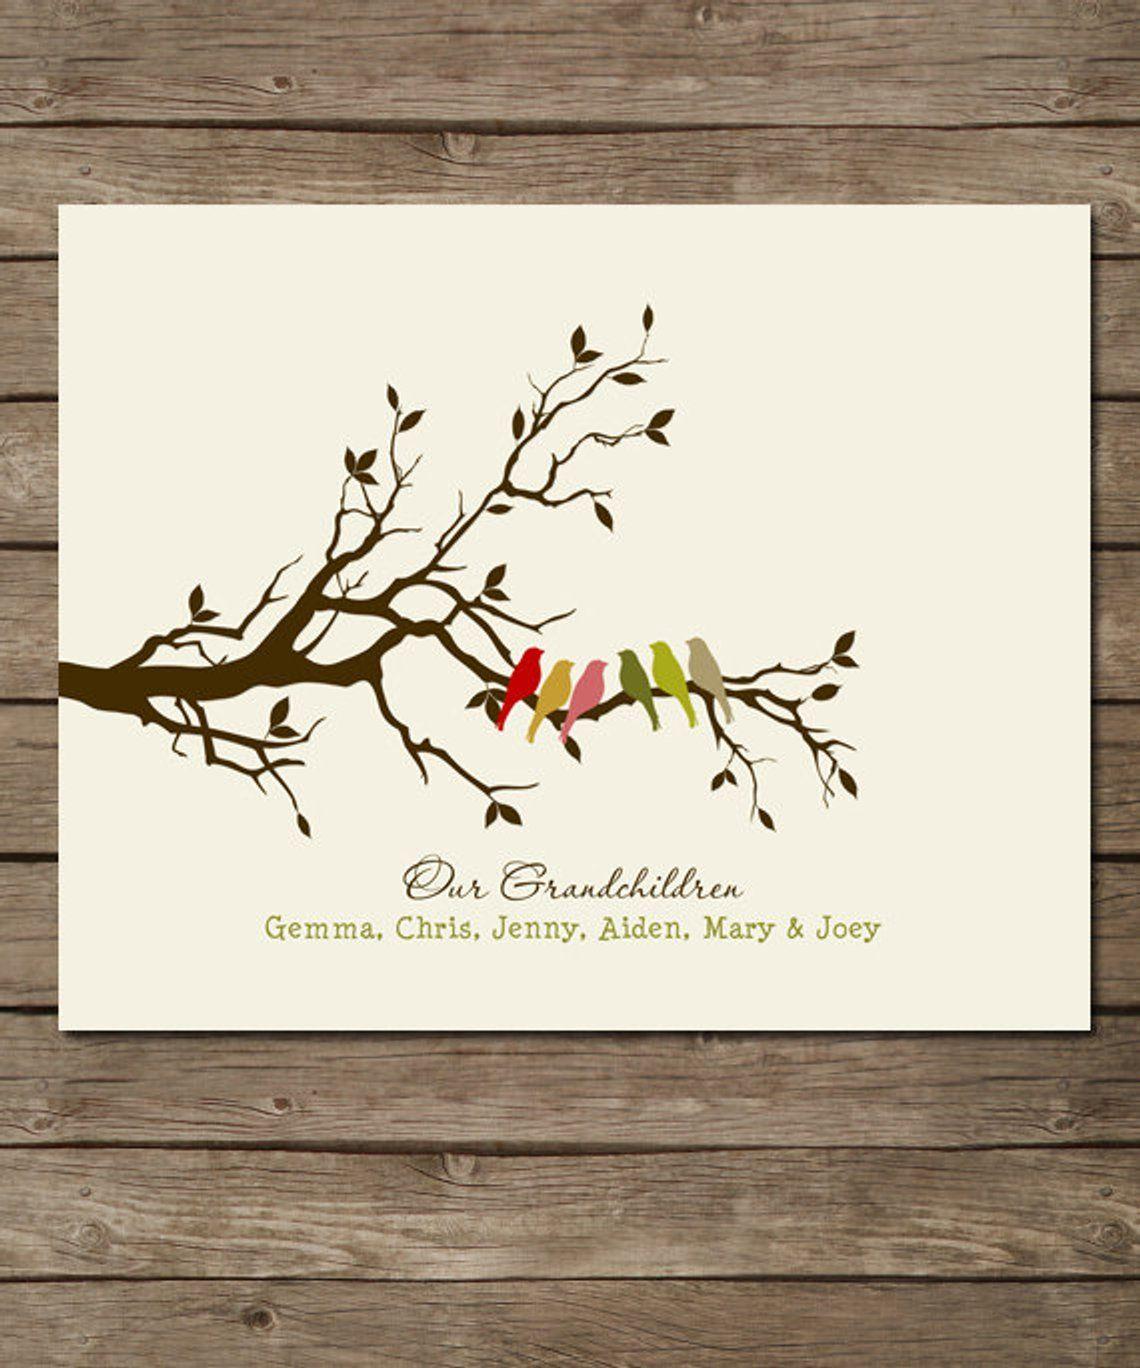 GRANDMA gift - NANA personalized print - Custom Gift for Grandmother - Birthday - Mother's Day - Christmas - Grandkids Names colors 8 x 10 #bestgiftsforgrandparents